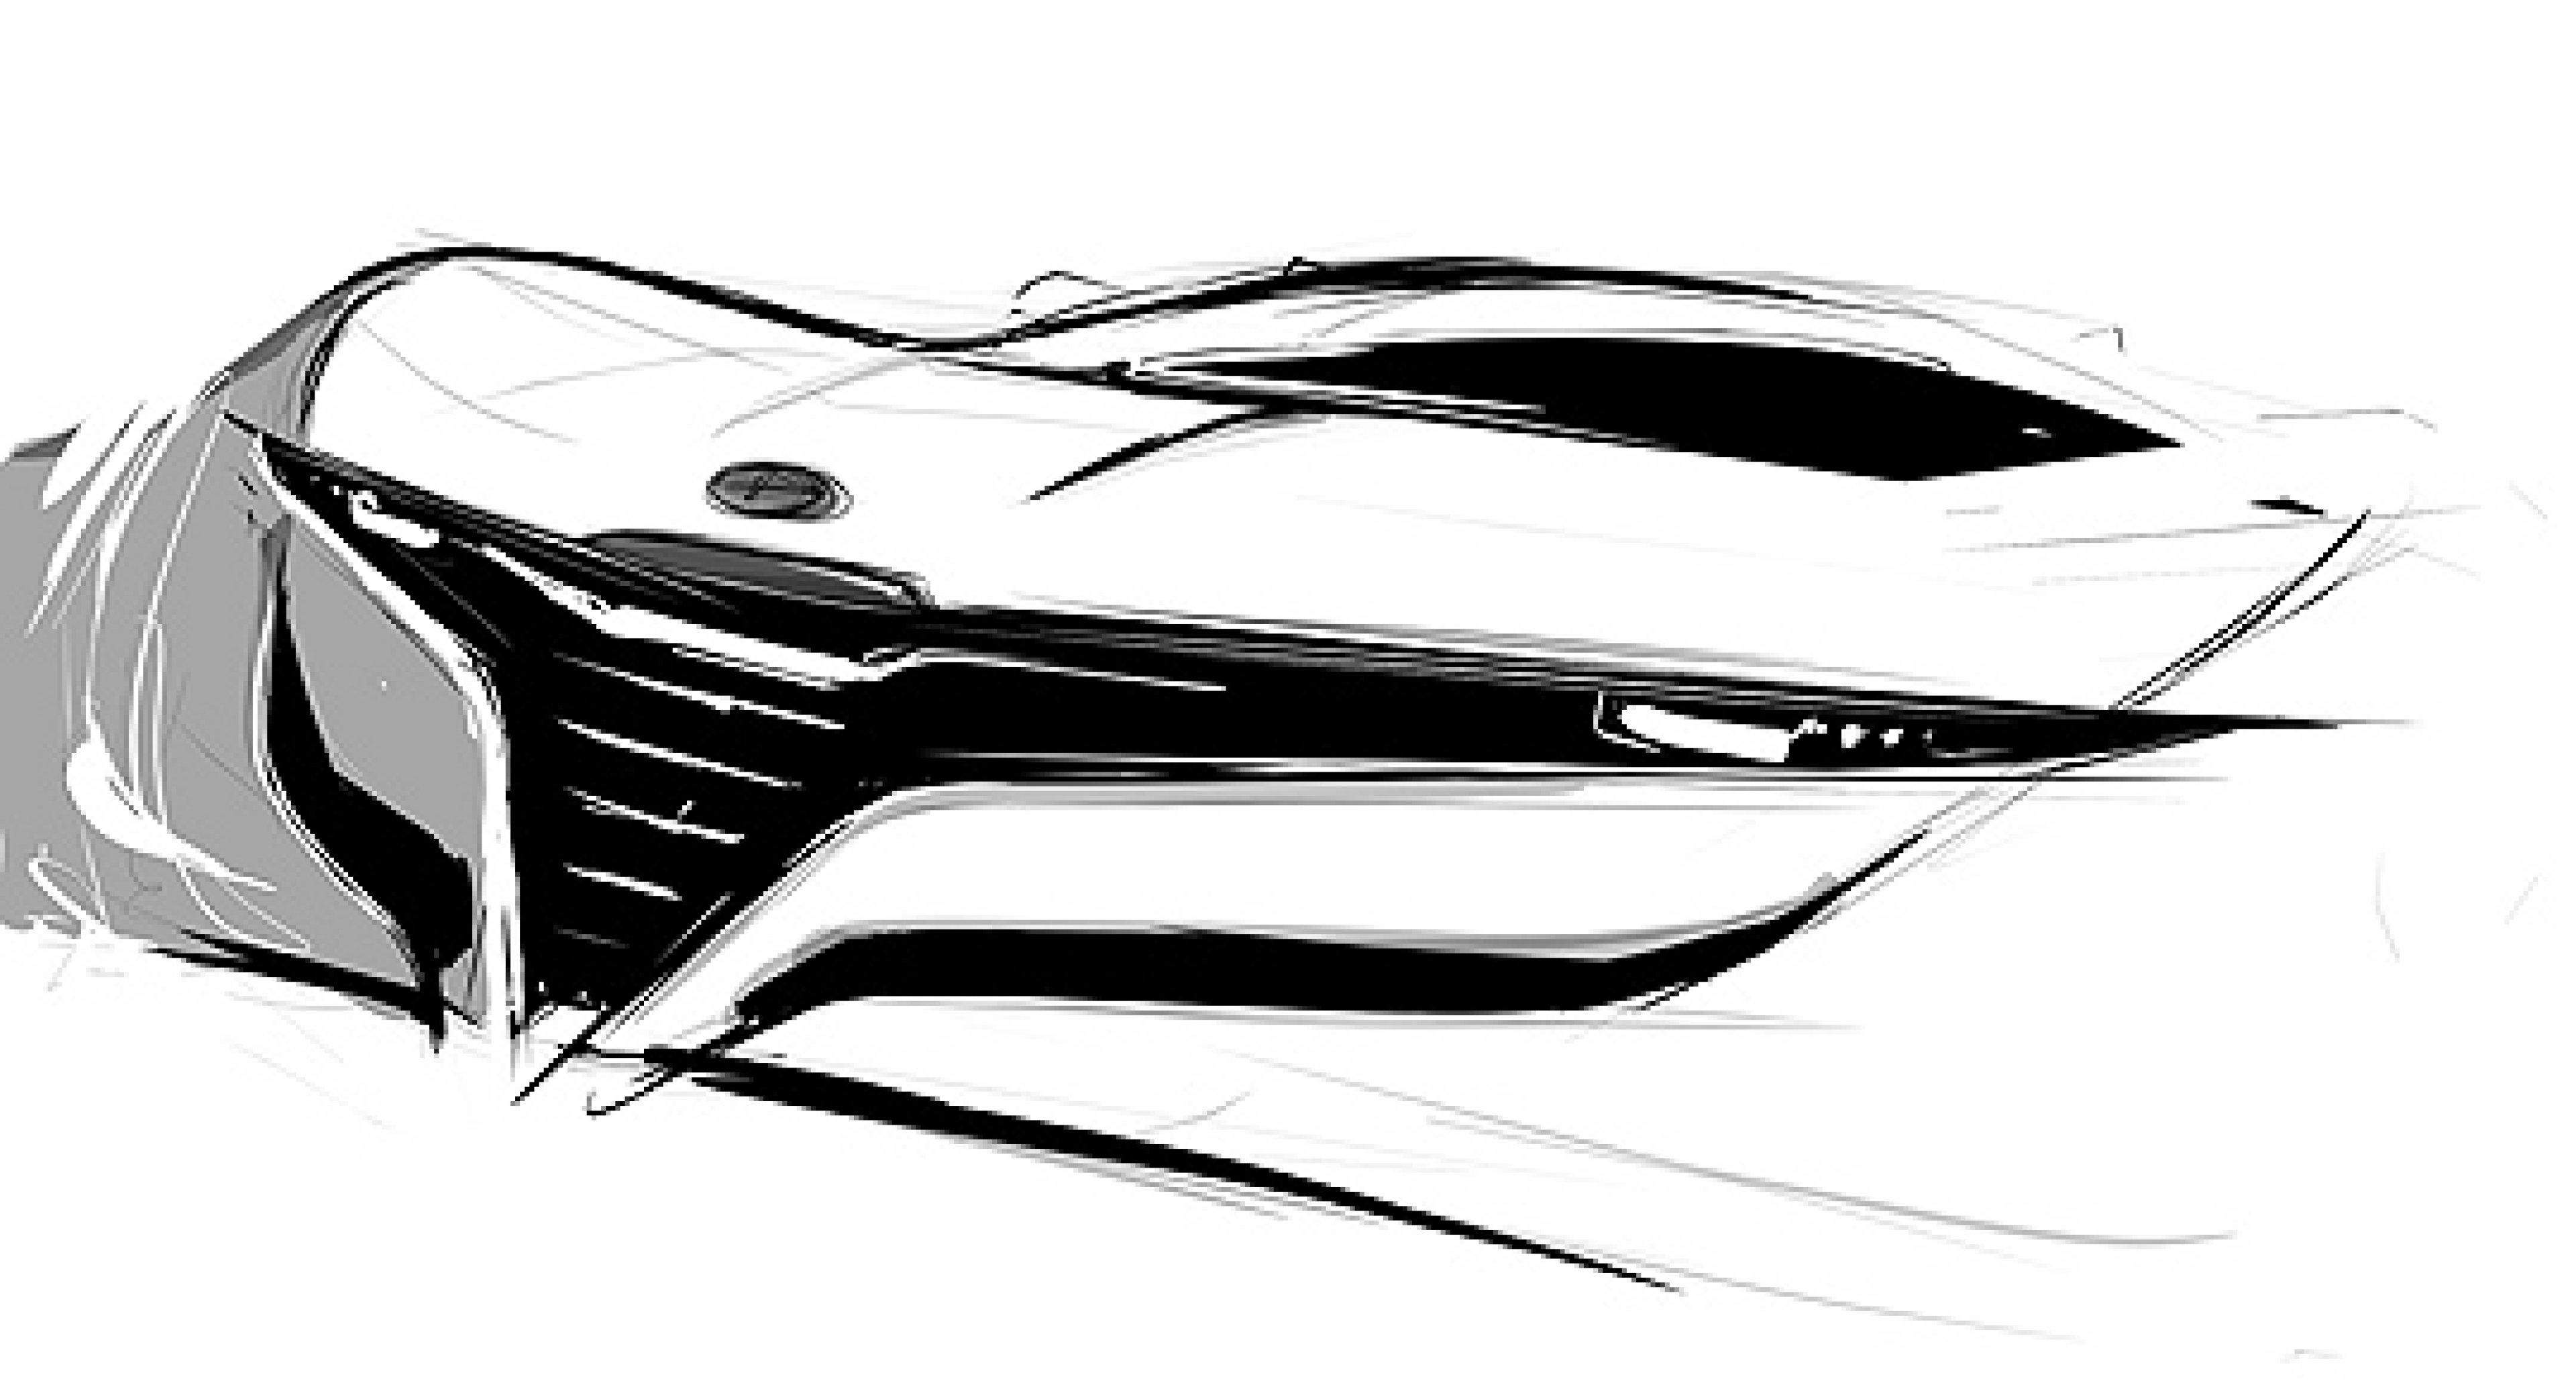 Genf 2010: Alfa-Studien von Bertone, Italdesign und Pininfarina